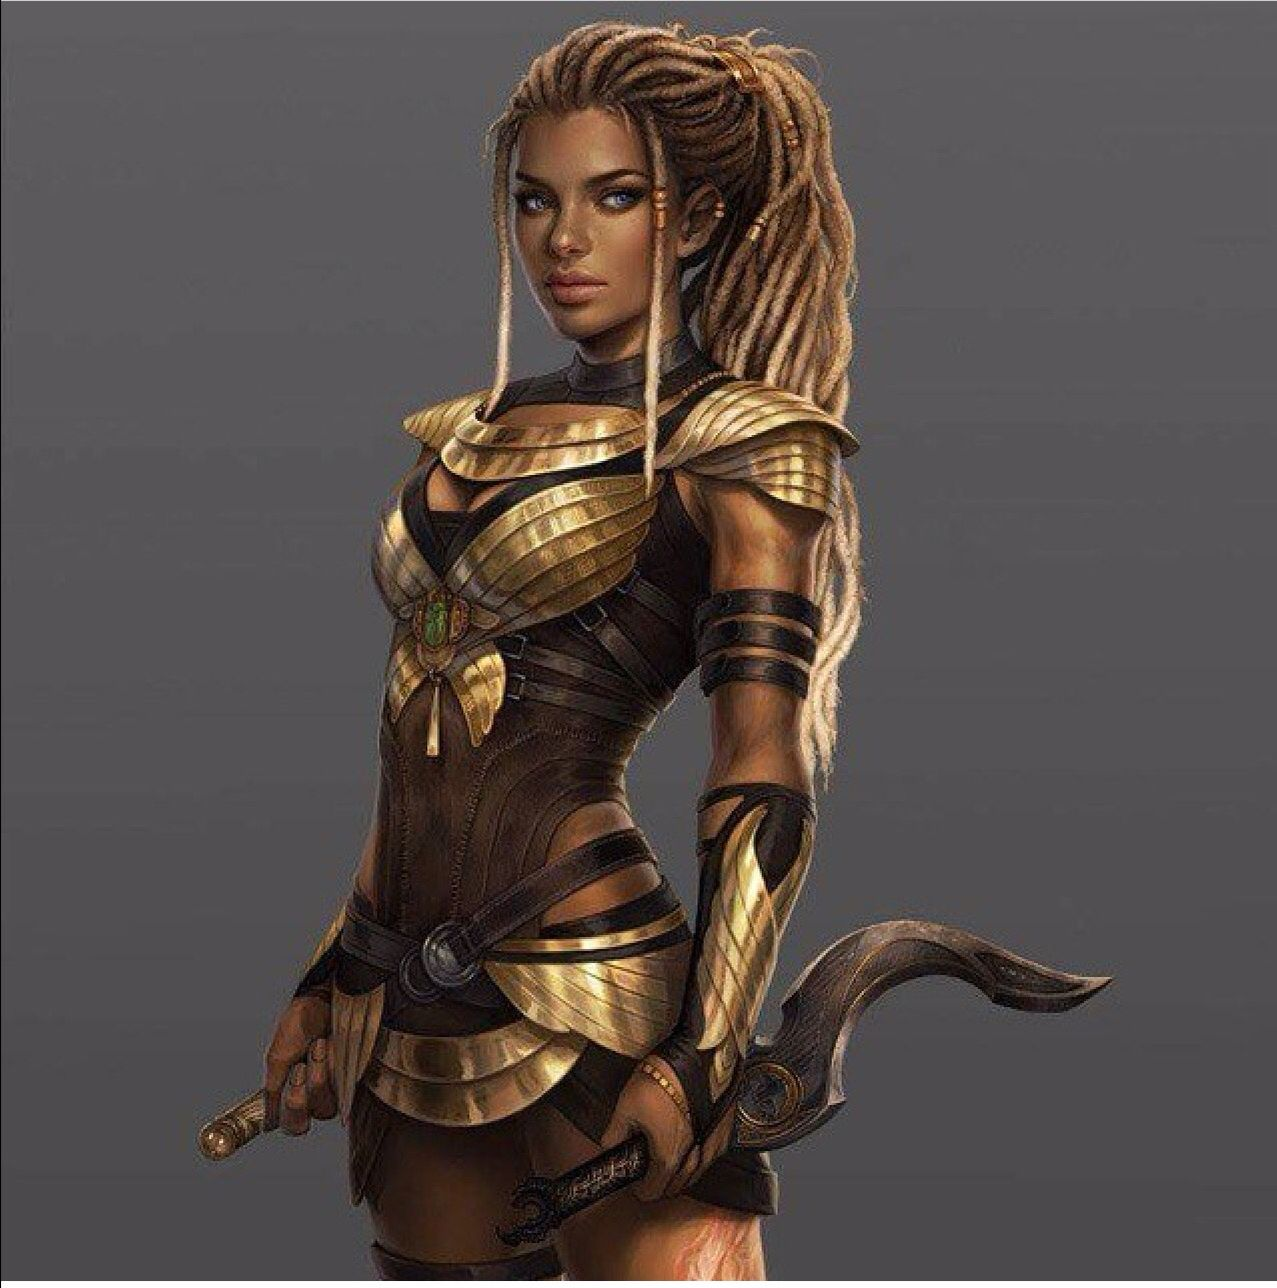 Black warrior black fantasy art in 2019 fantasy art - Fantasy female warrior artwork ...